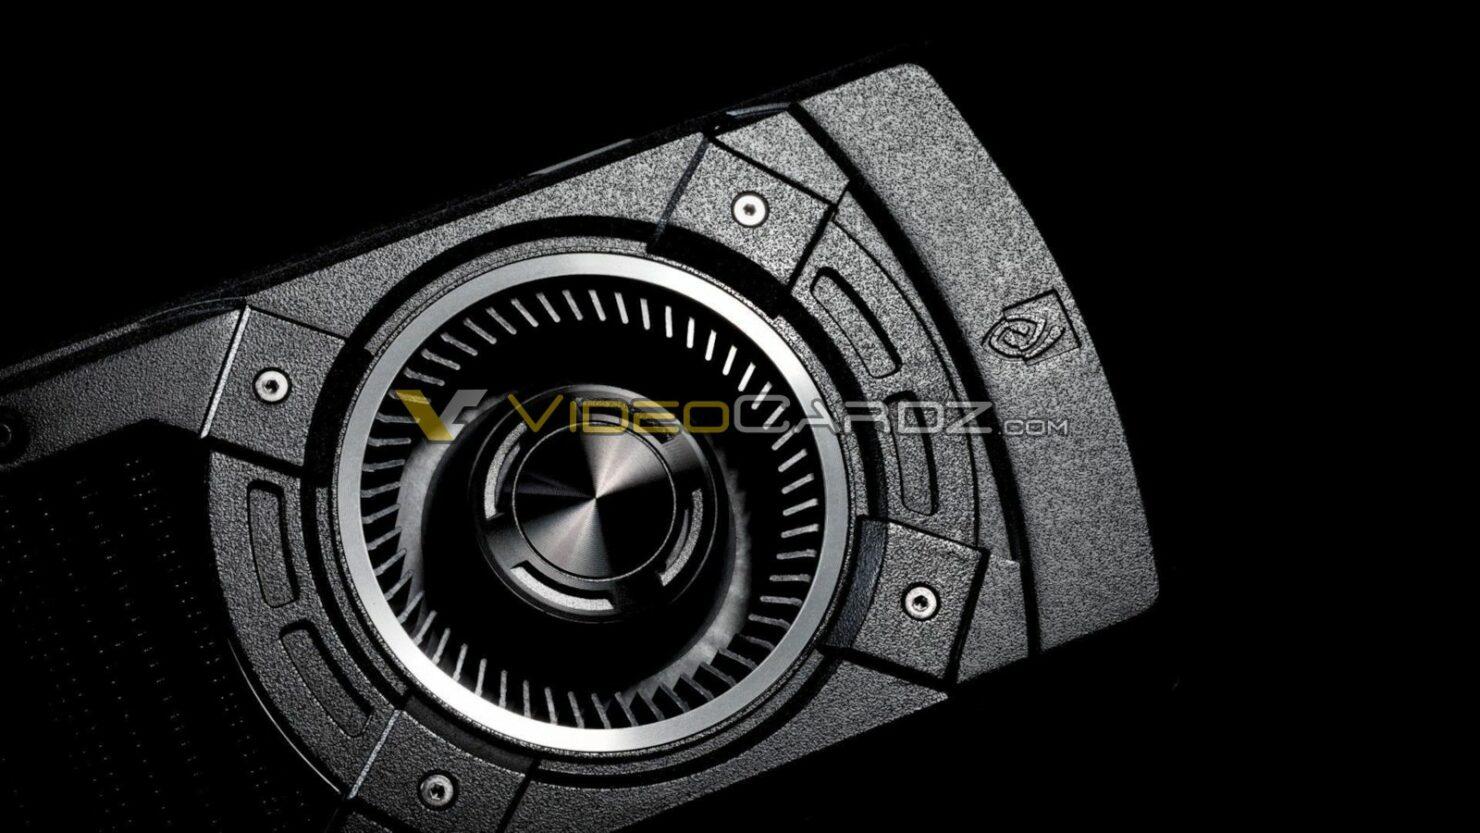 nvidia-geforce-gtx-titan-x_beauty-shots_7